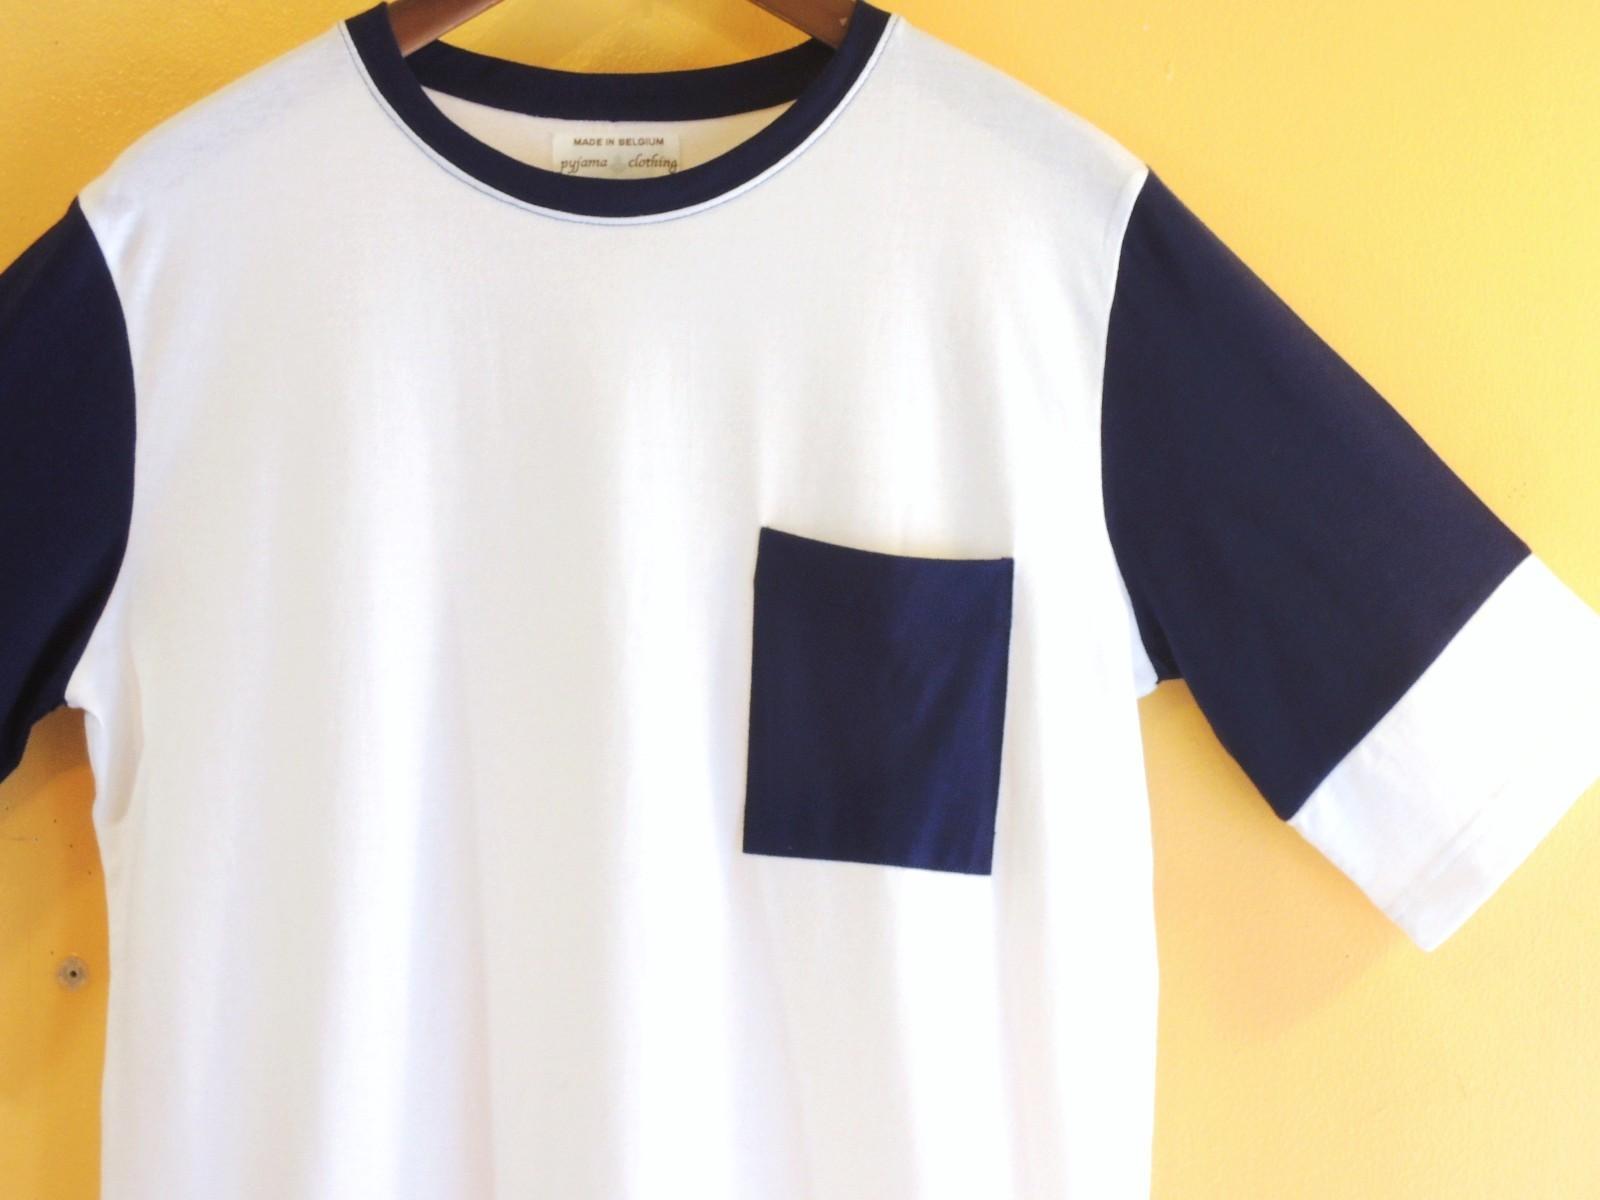 pyjamaclothing2tonepockettshirts01.JPG